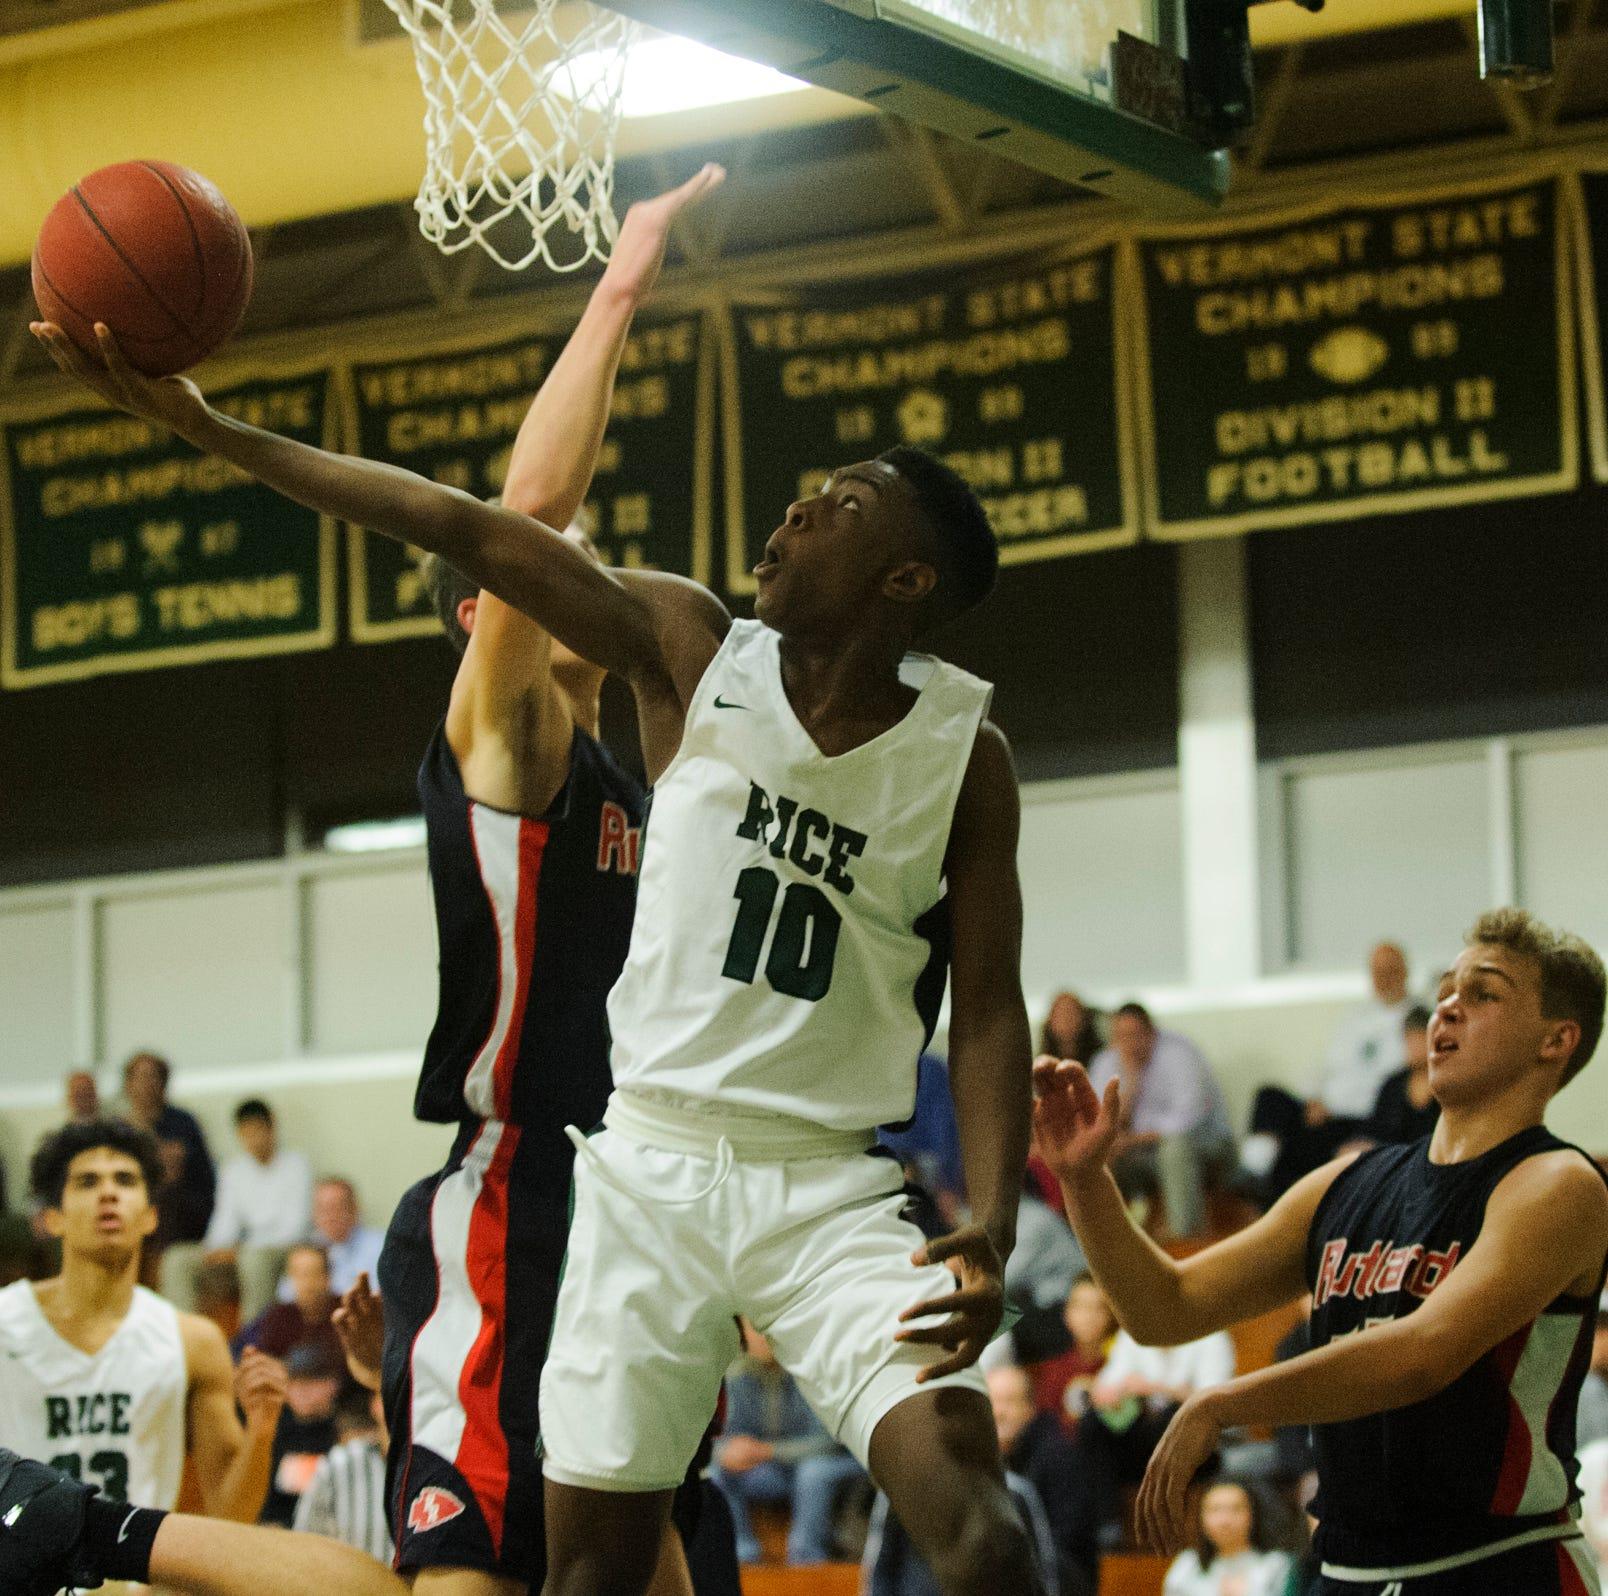 Vermont boys basketball: Rice snaps Rutland's 43-game winning streak